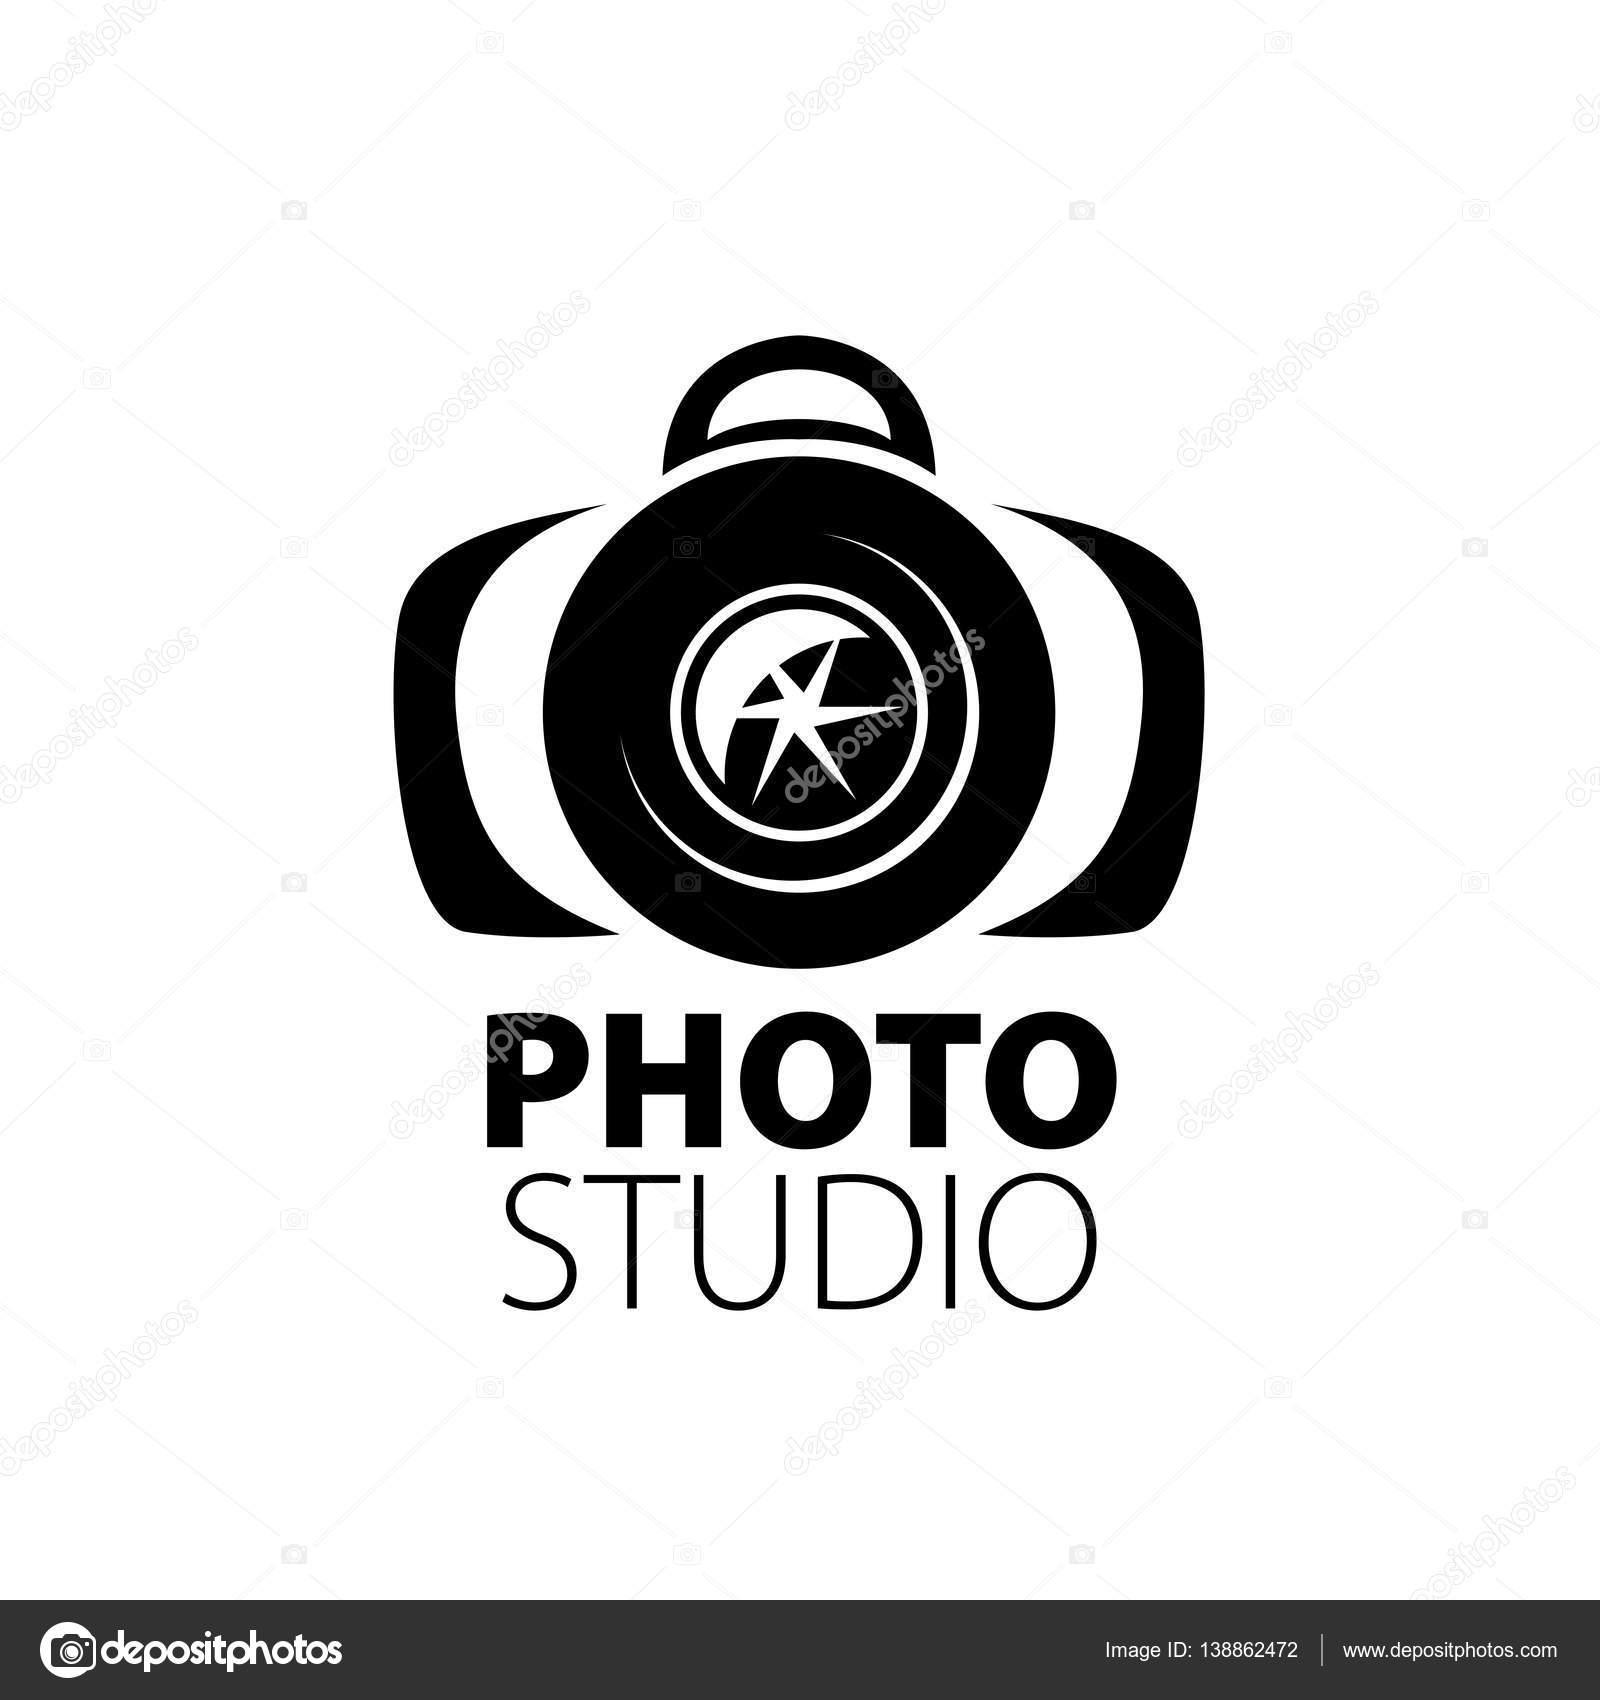 Conosciuto logo per studio fotografico — Vettoriali Stock © artbutenkov  MW04